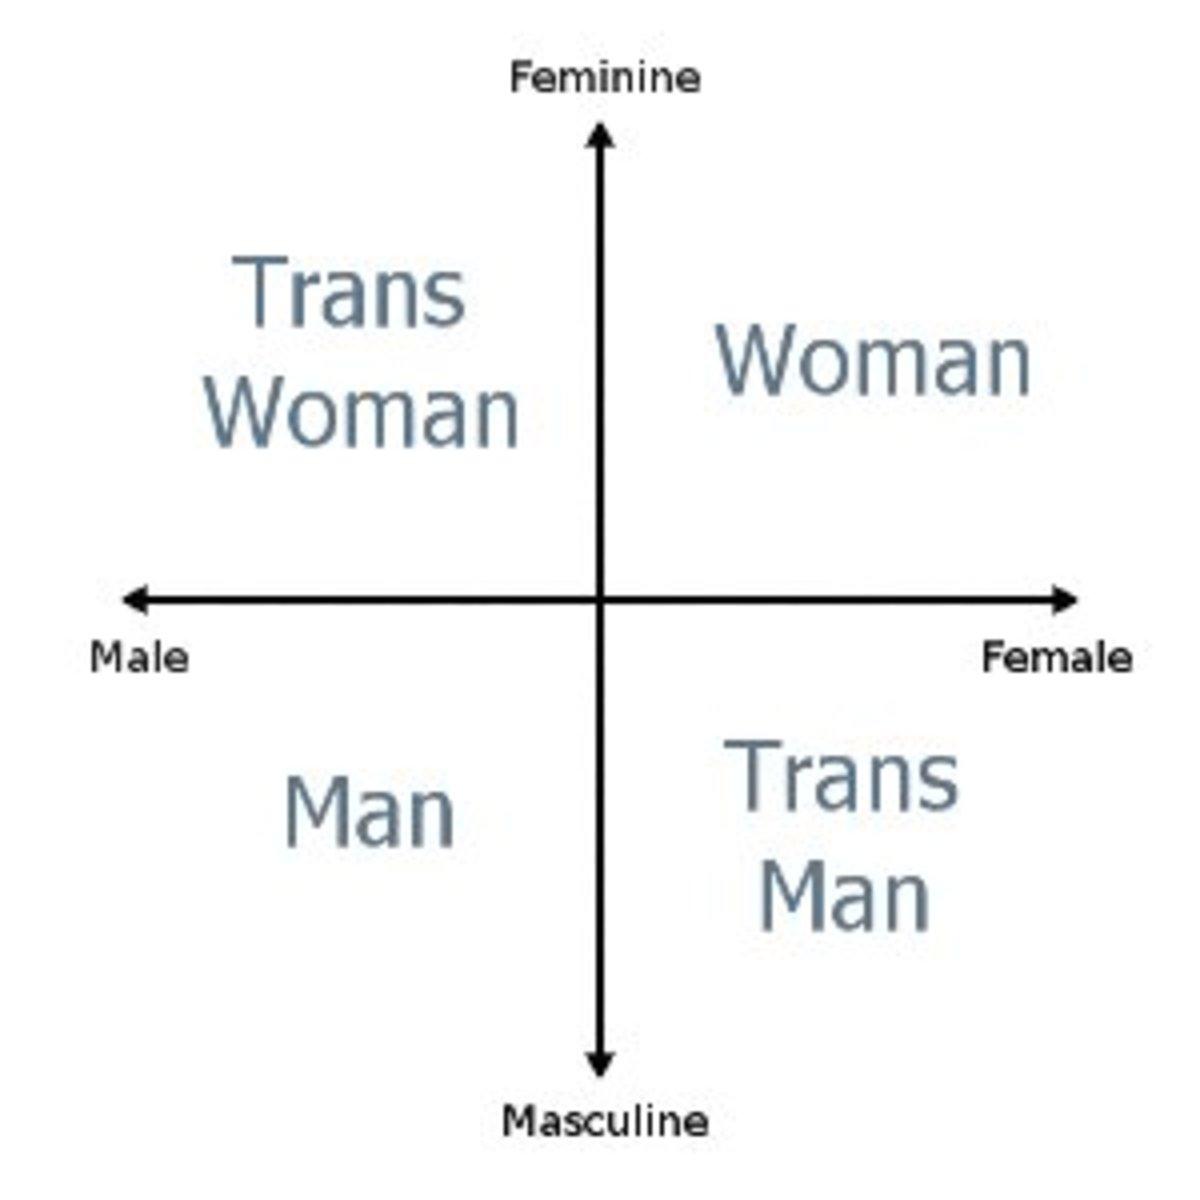 modeling-sexual-identities-intersex-transgender-gender-binary